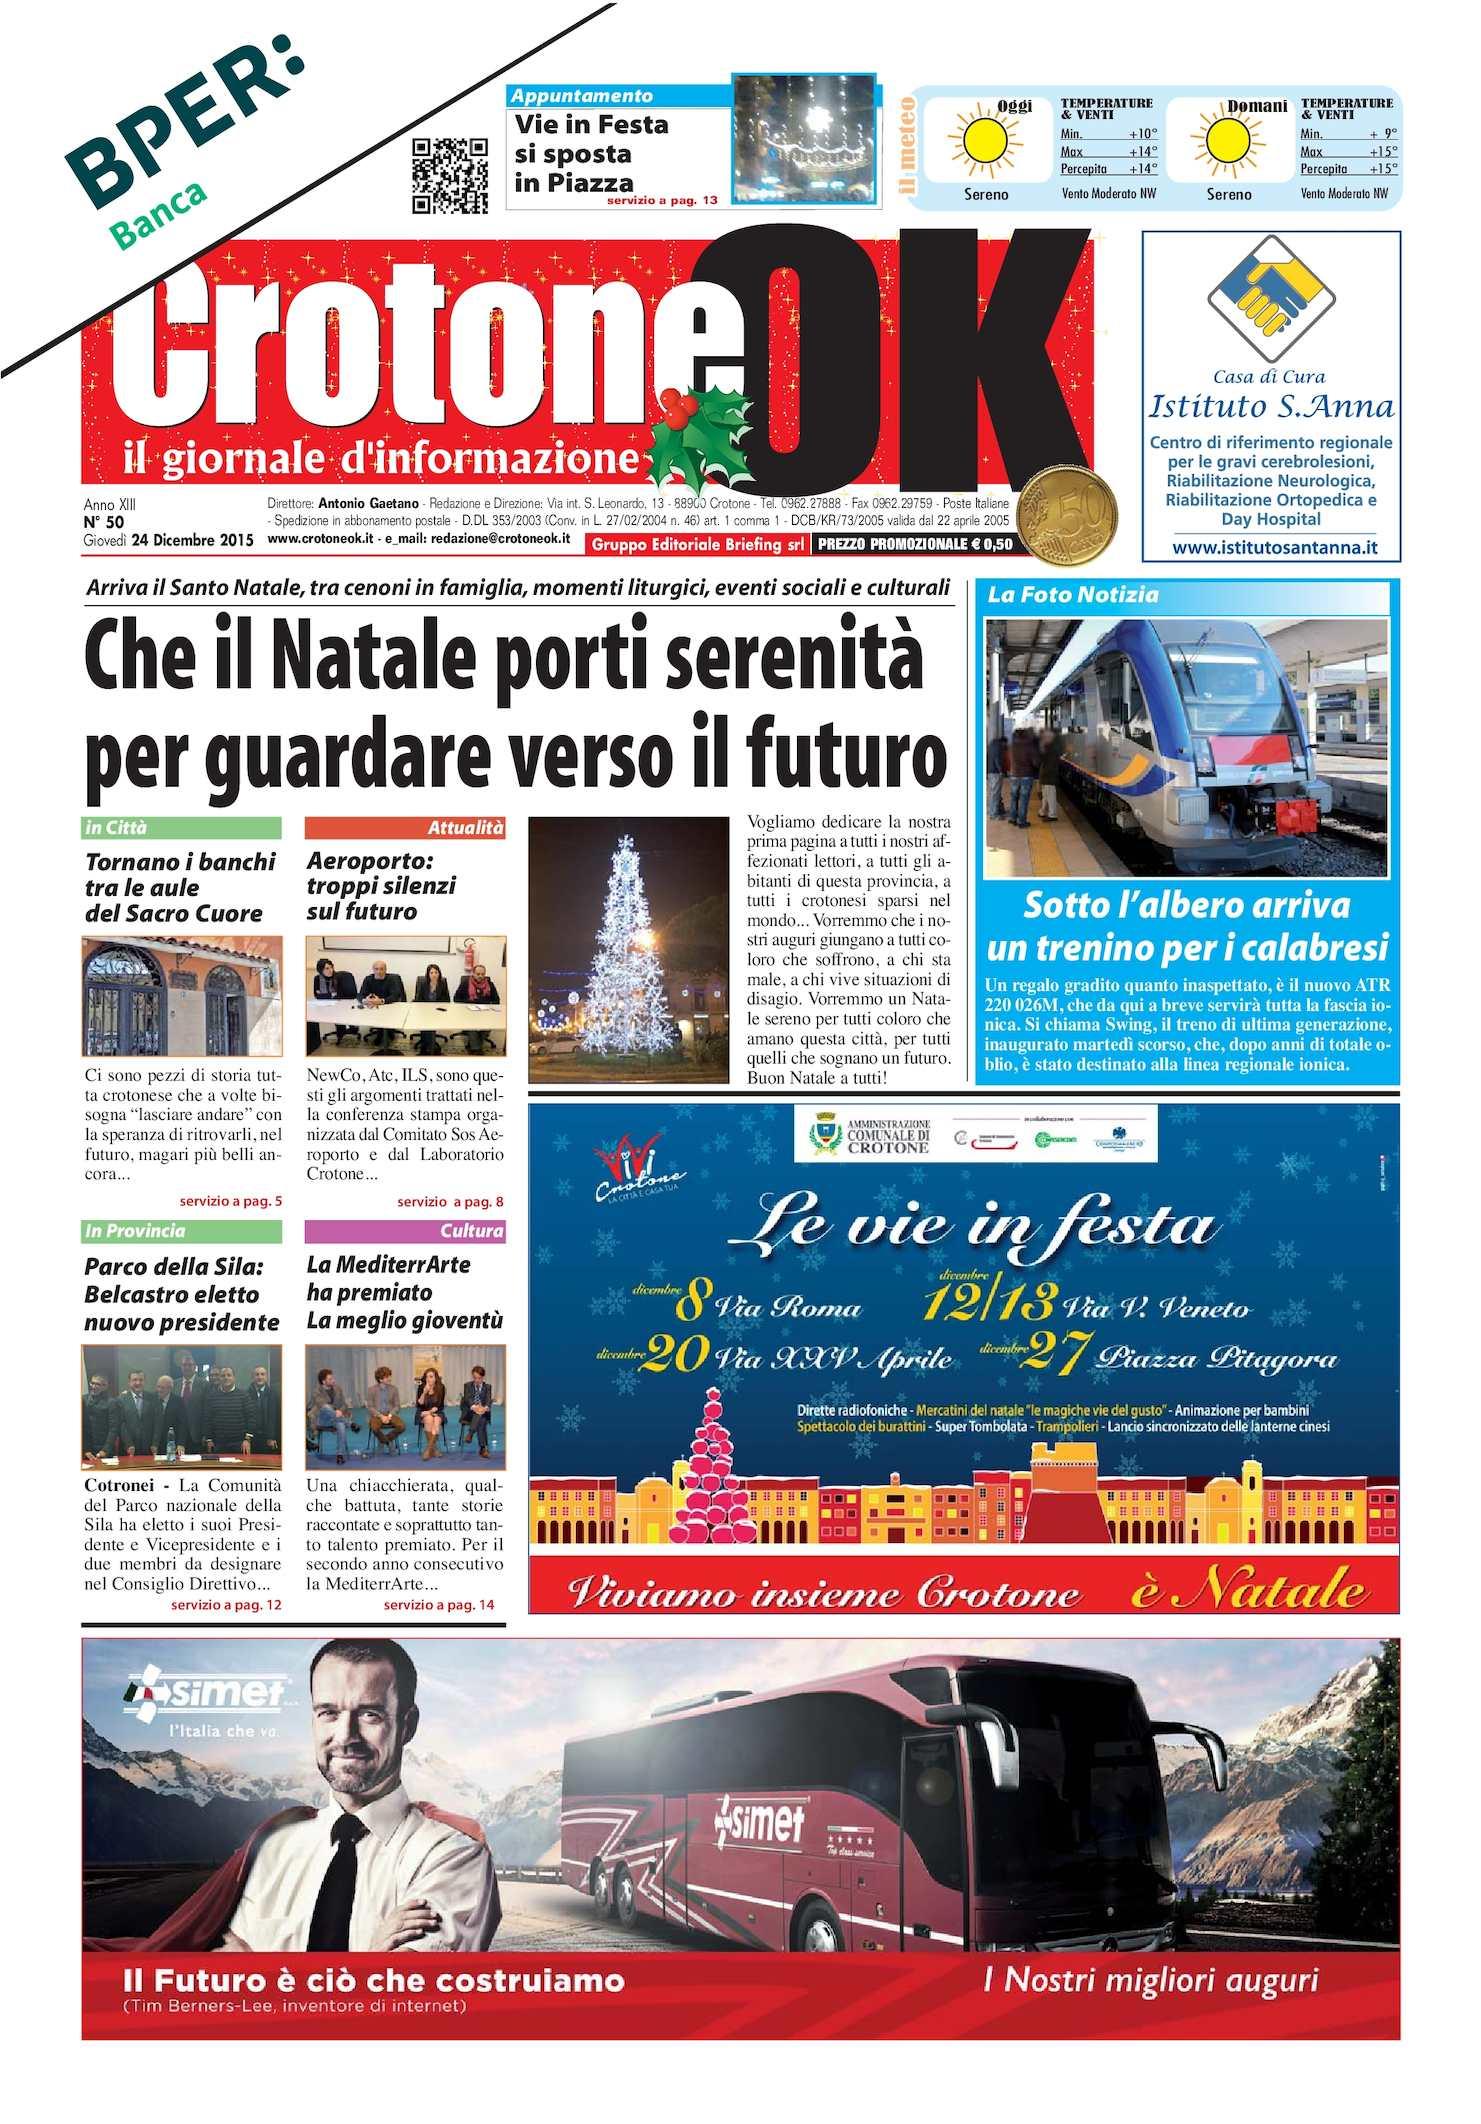 Calameo Giornale Crotoneok N 50 2015